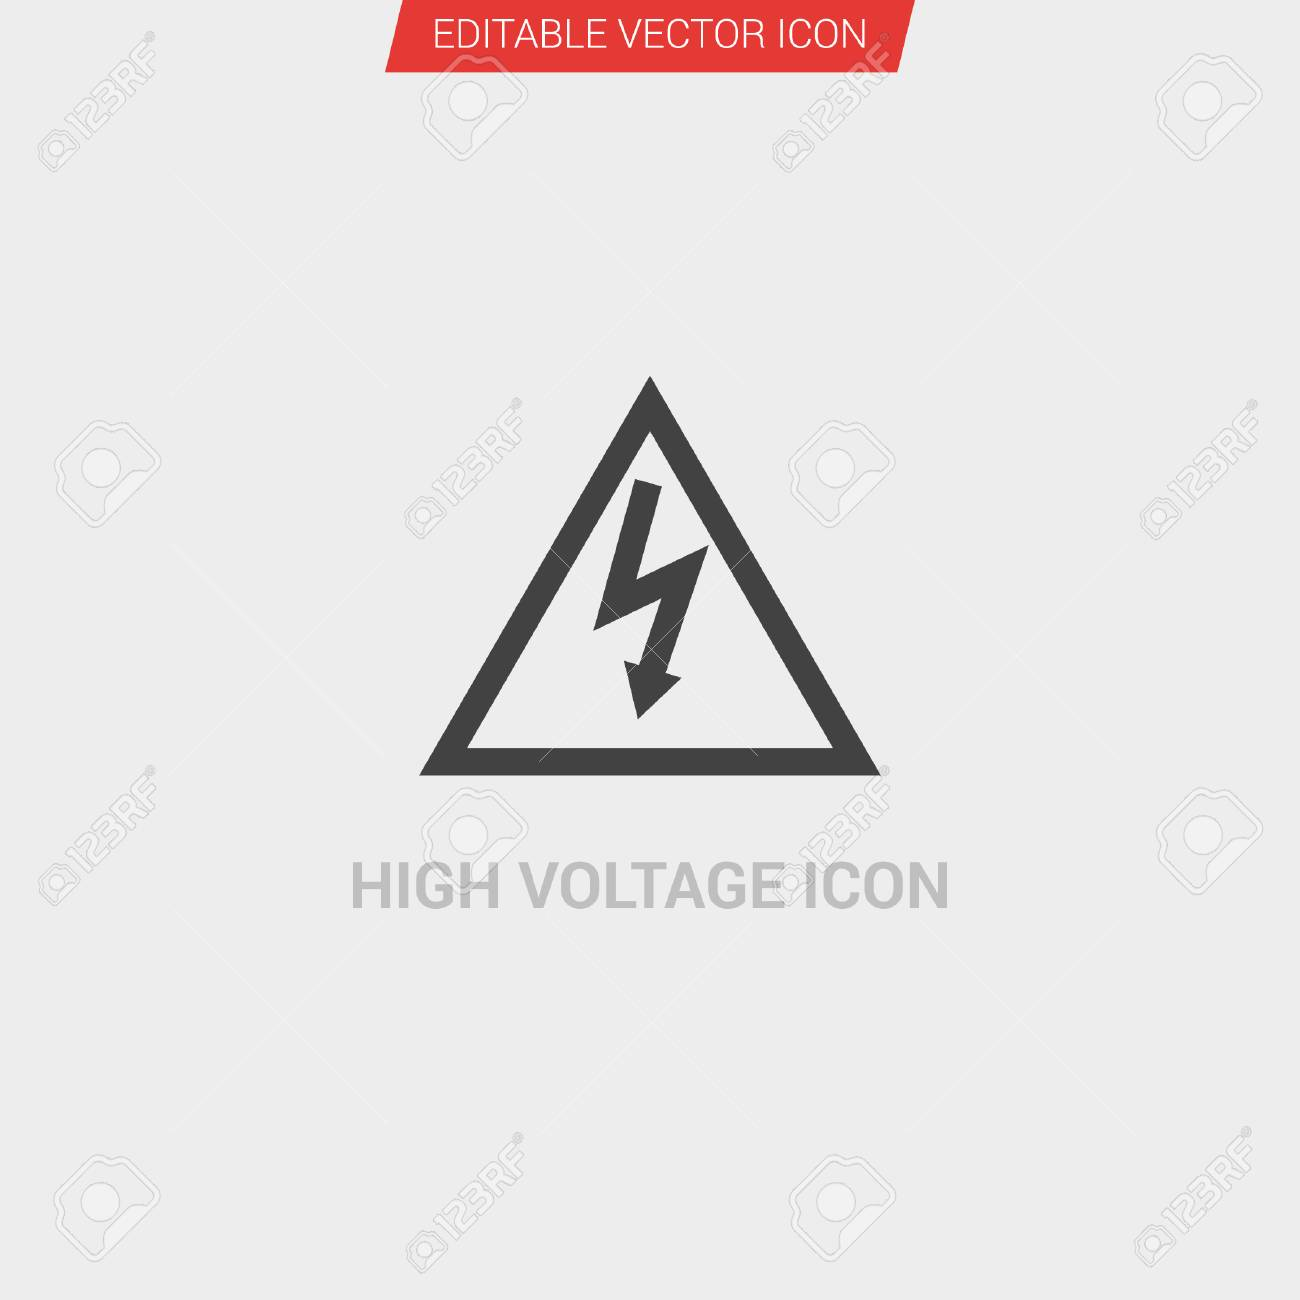 befc26f4cbea High Voltage icon dark grey new trendy flat style vector symbol Stock  Vector - 99879829